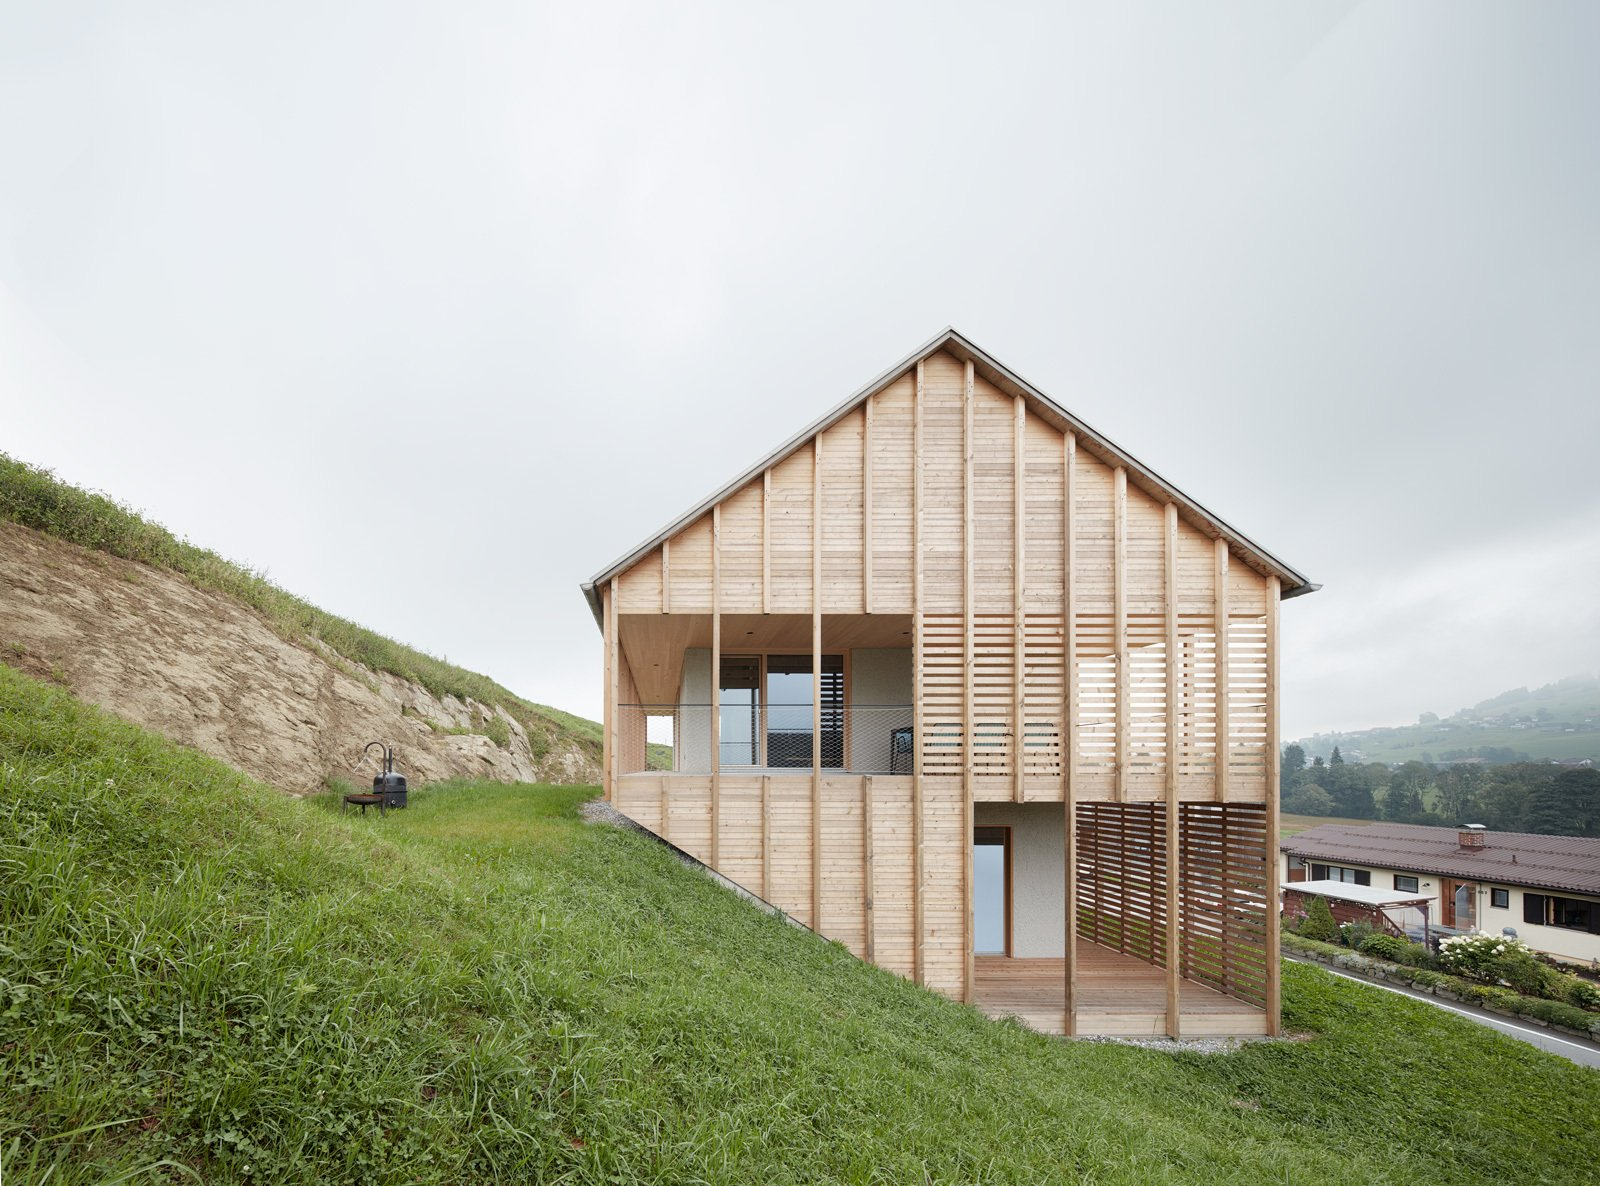 A Minimalist Home Is Built Into Steep Terrain In An Austrian Valley